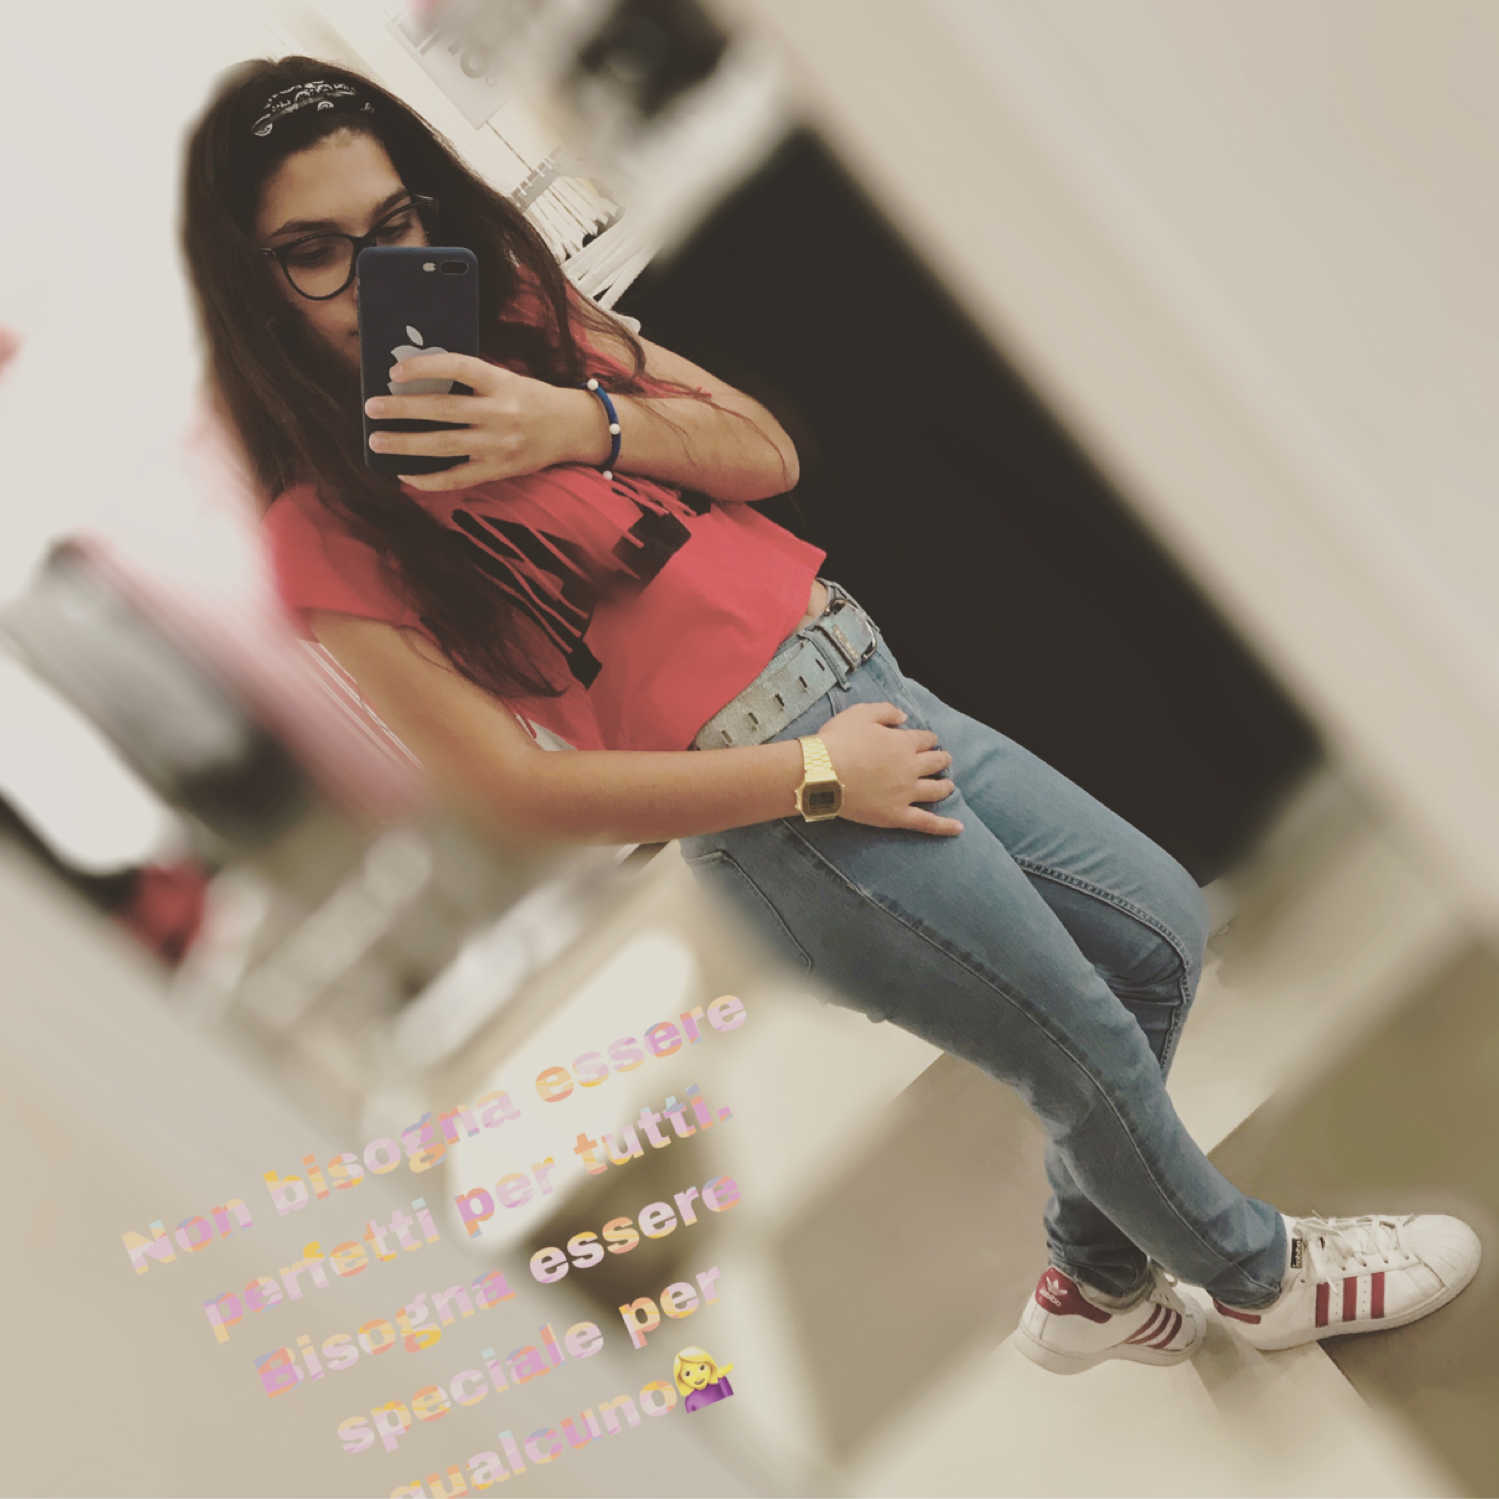 Alessia Romeo